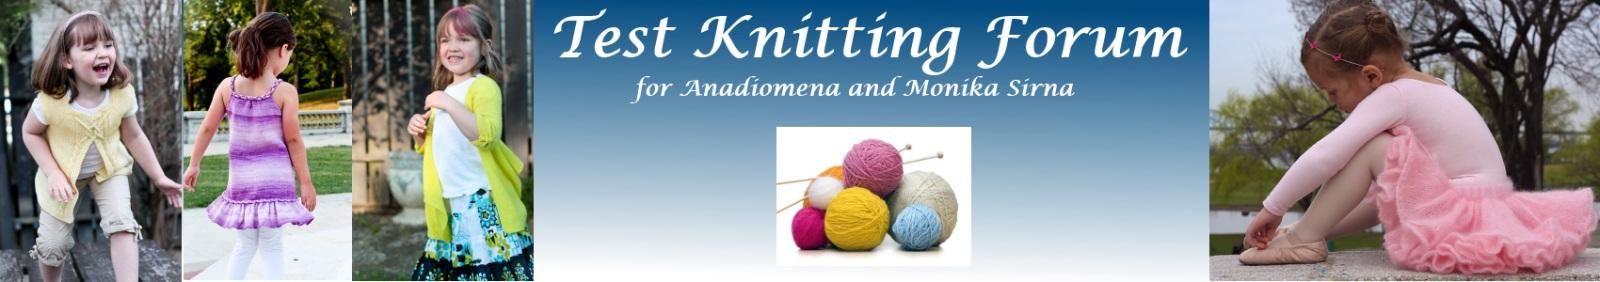 Test Knitting Forum for Anadiomena and Monika Sirna